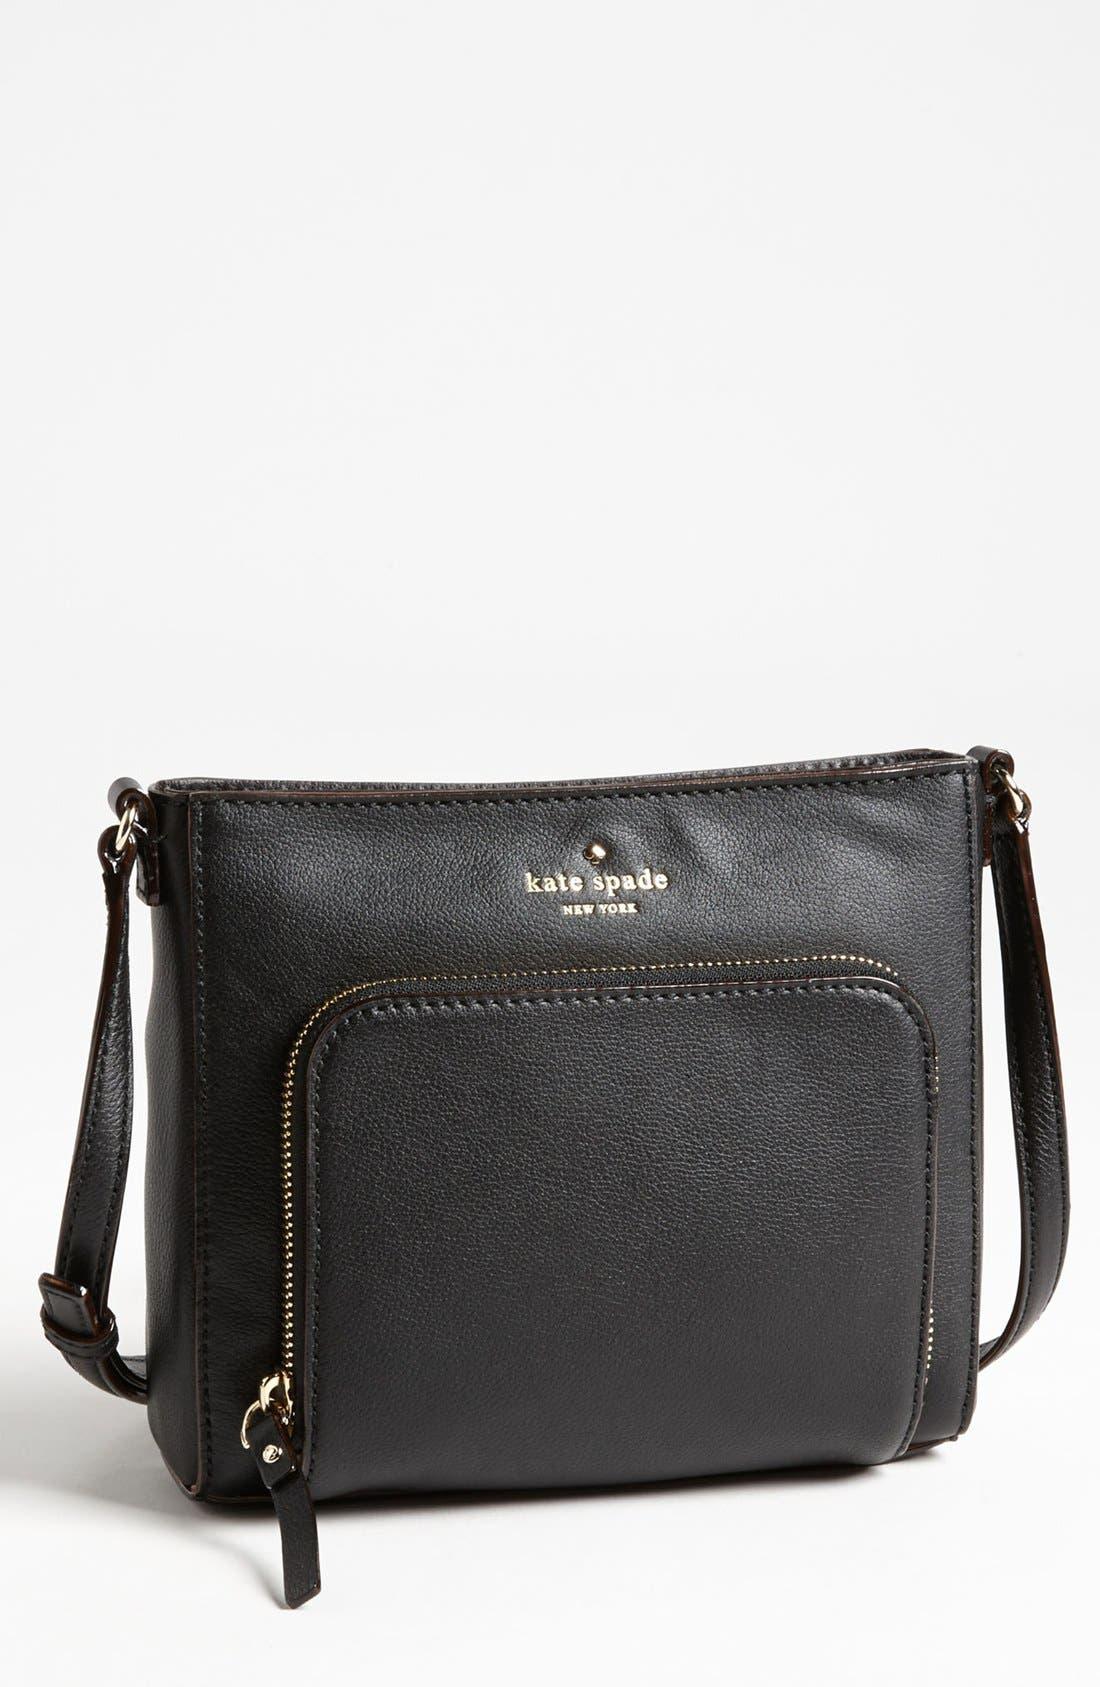 Main Image - kate spade 'hester street - bess' crossbody bag